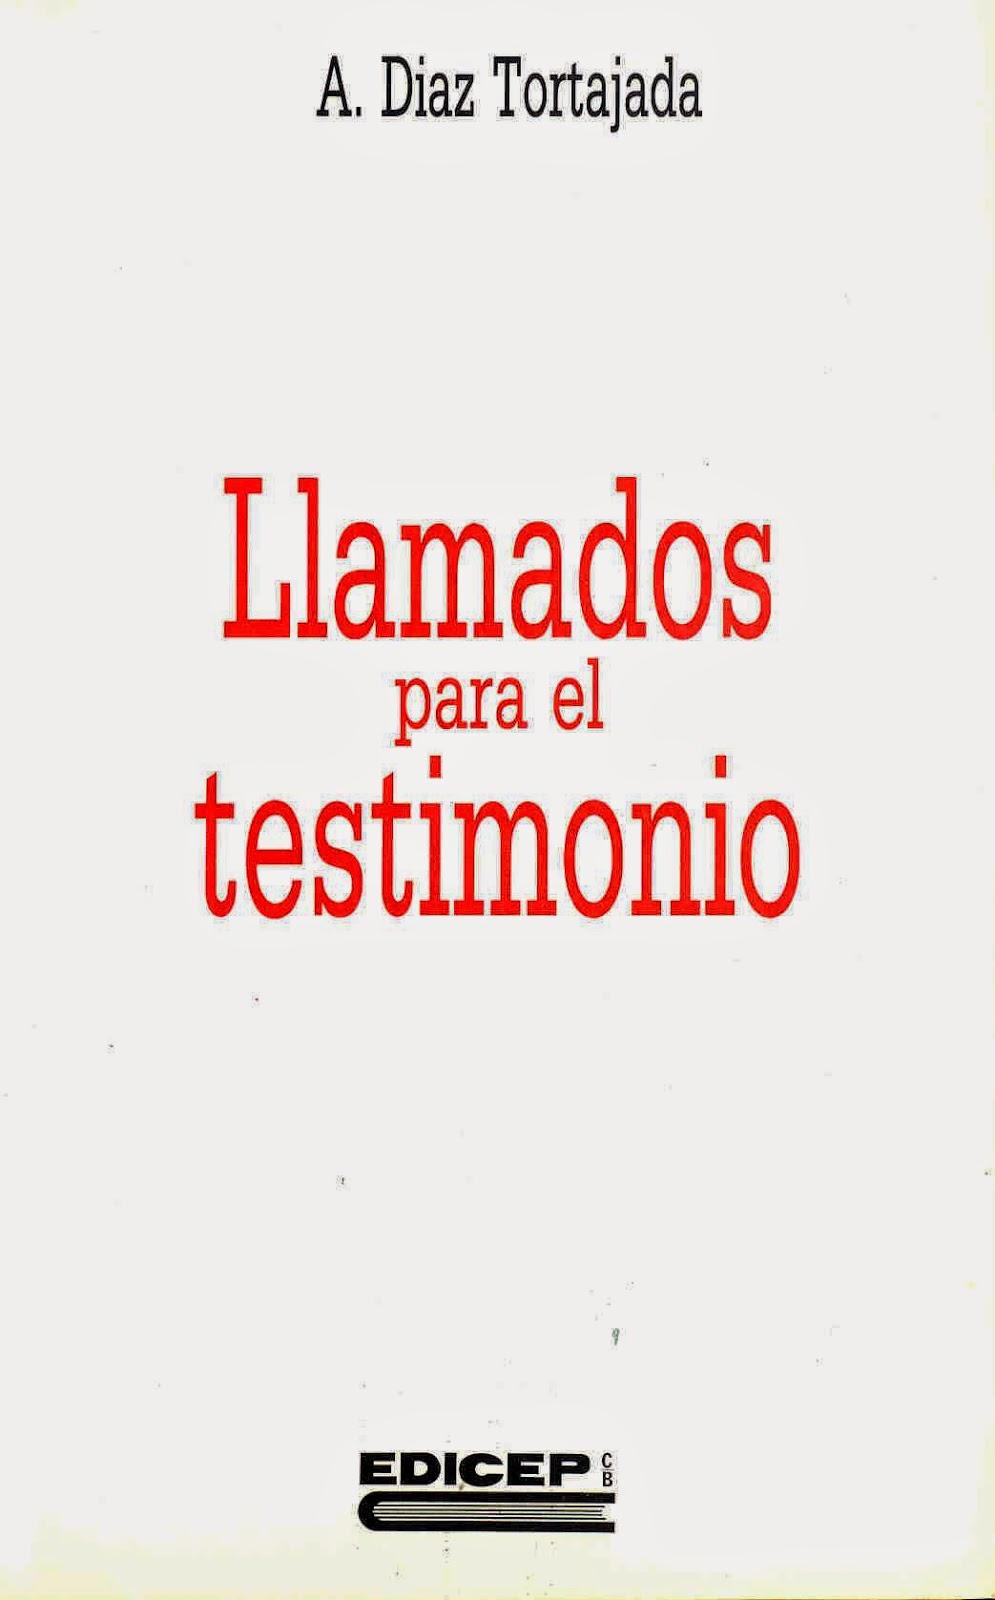 antonio-diaz-tortajada-llamados-testimonio